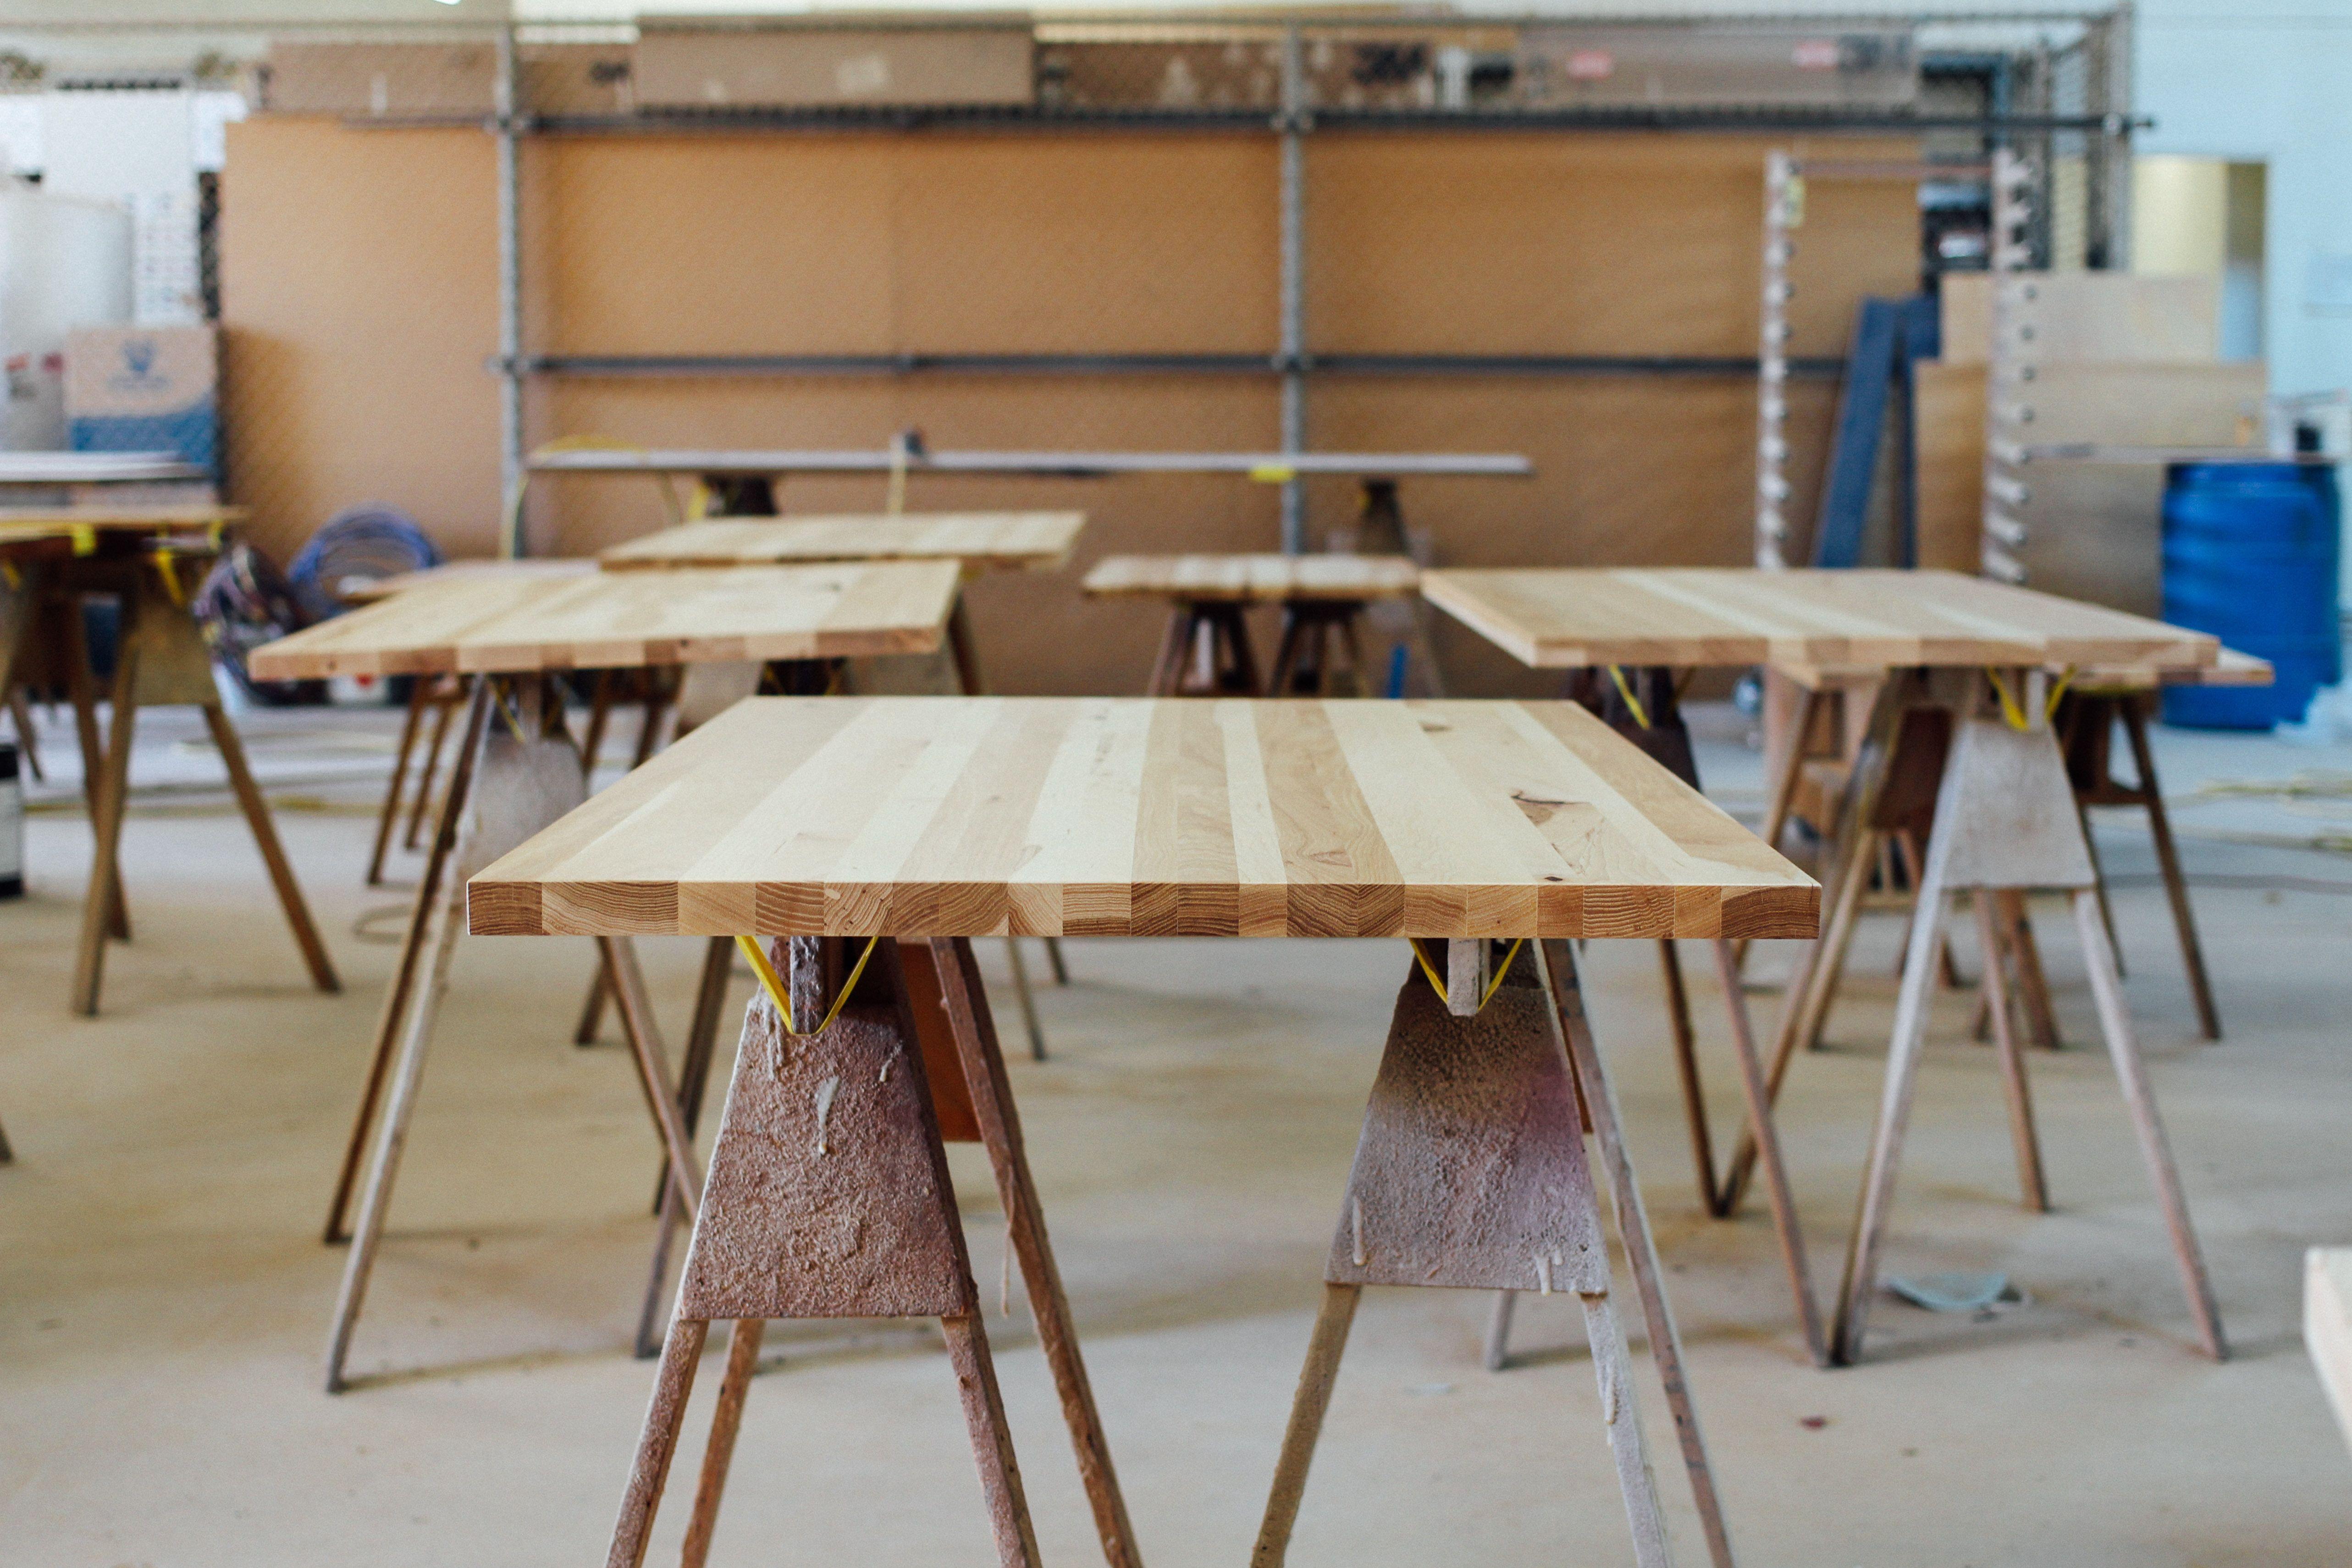 Mashstudios table top